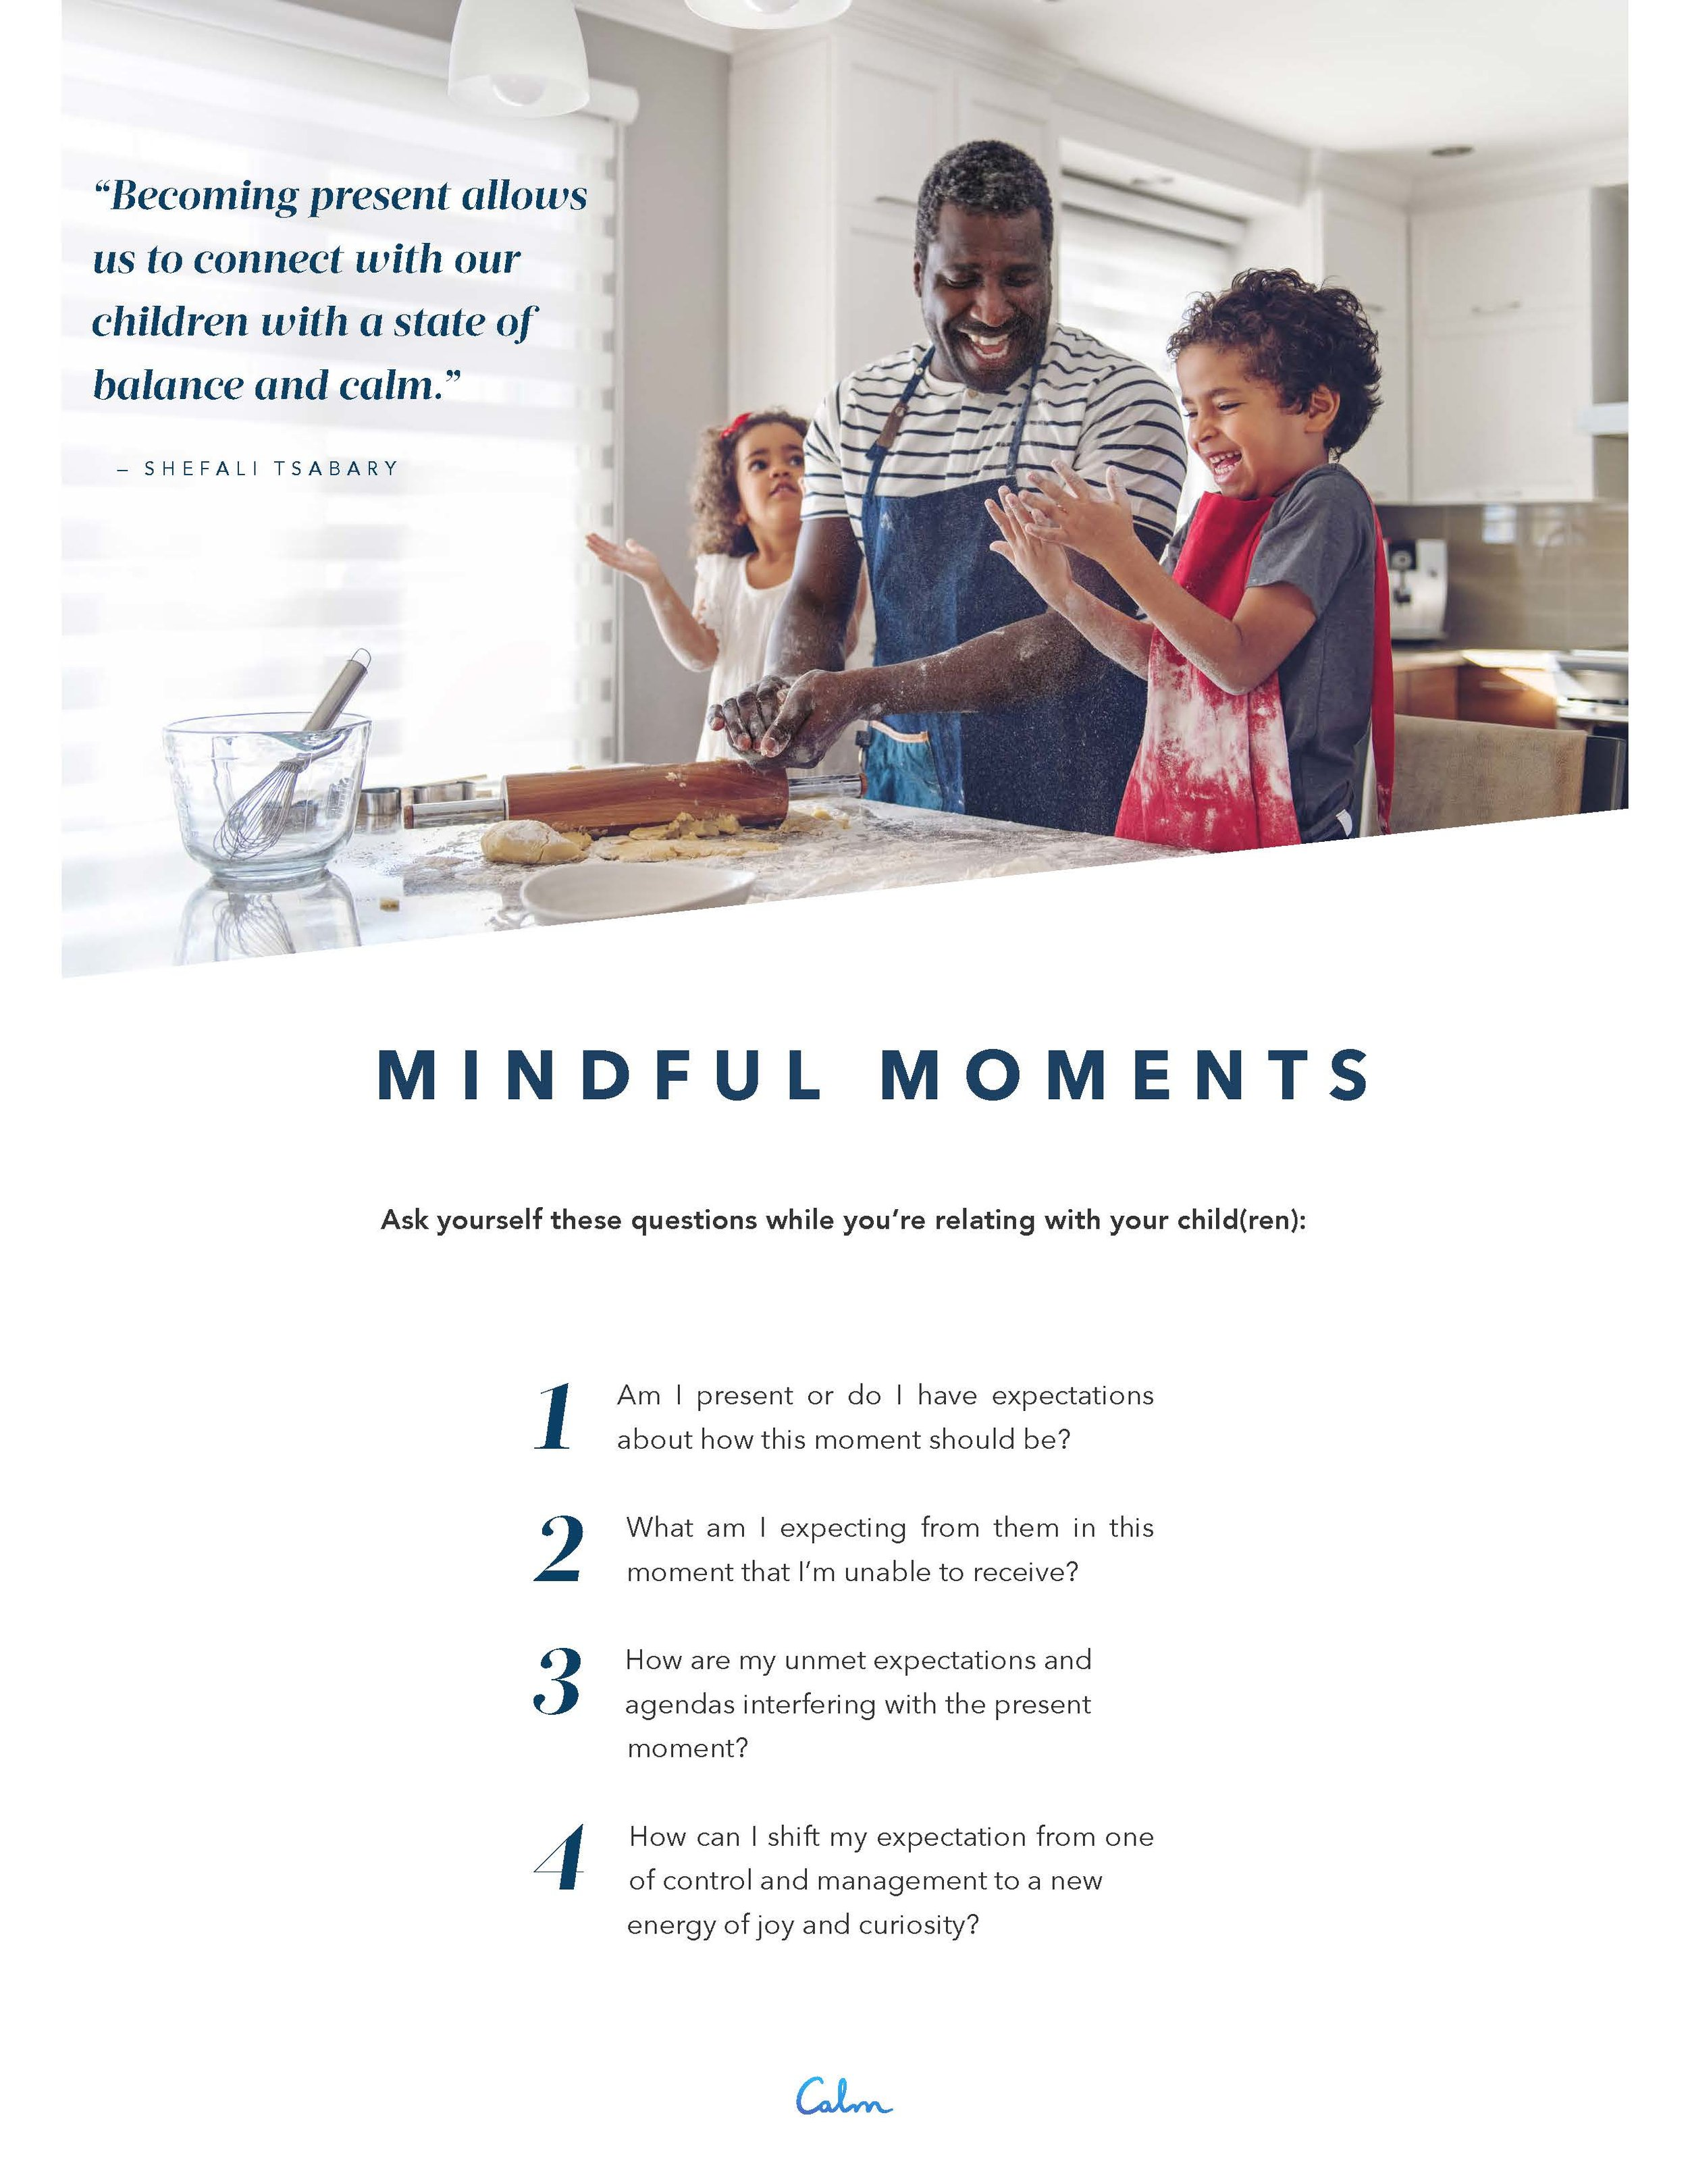 Conscious Parenting Workbook_Page_09.jpg